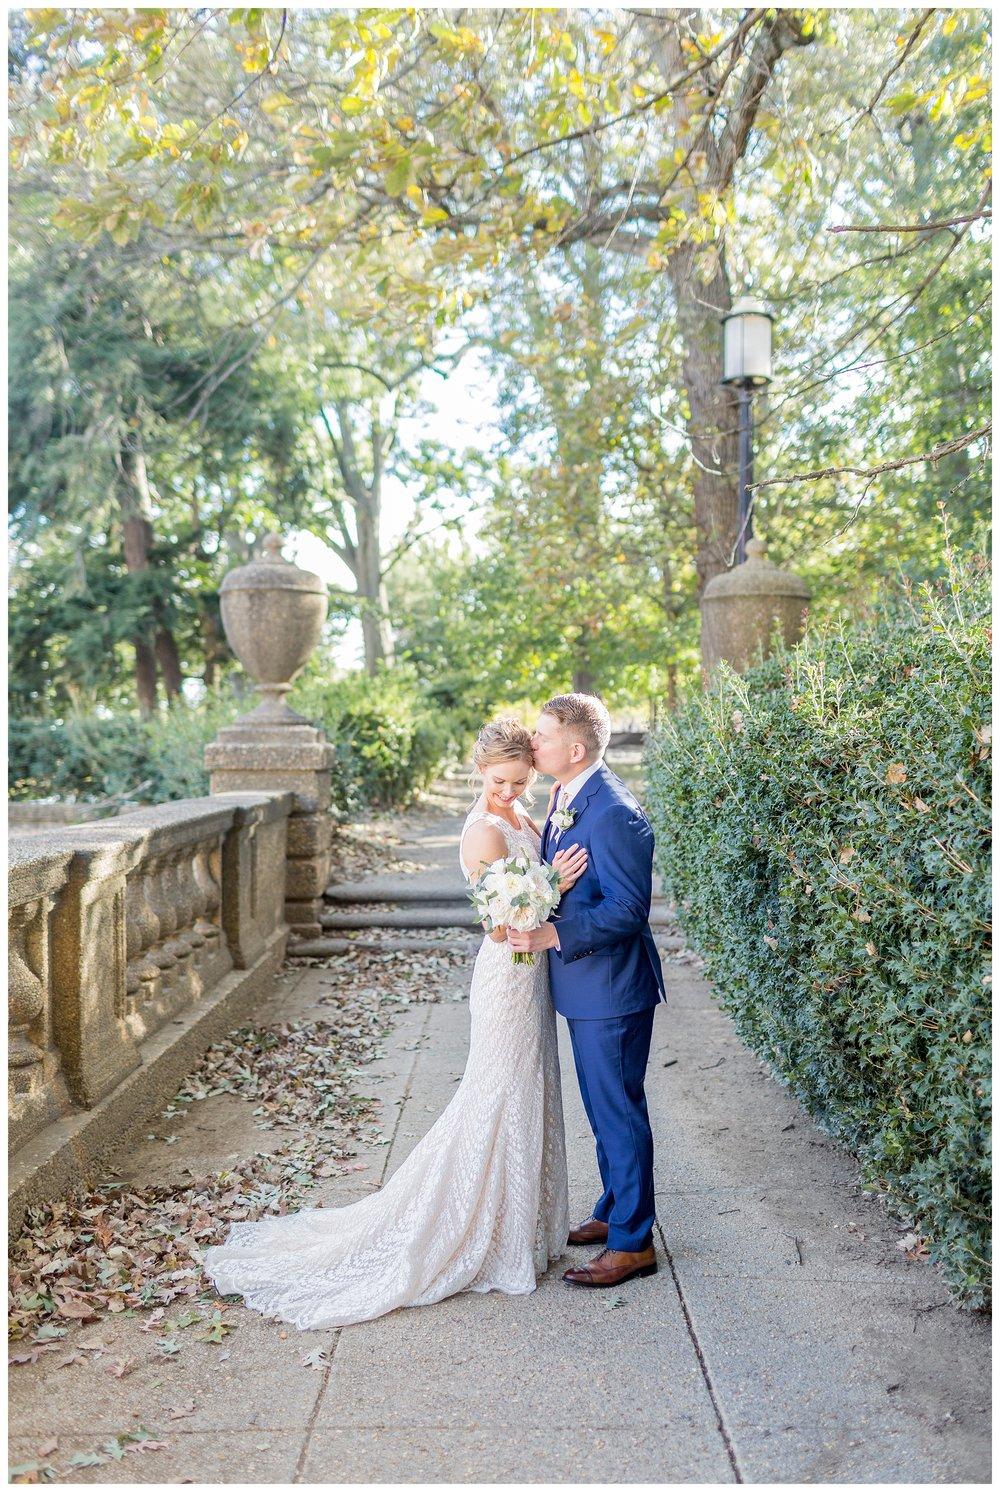 Meridian Hill Park Wedding | Washington DC Wedding Photographer Kir Tuben_0035.jpg